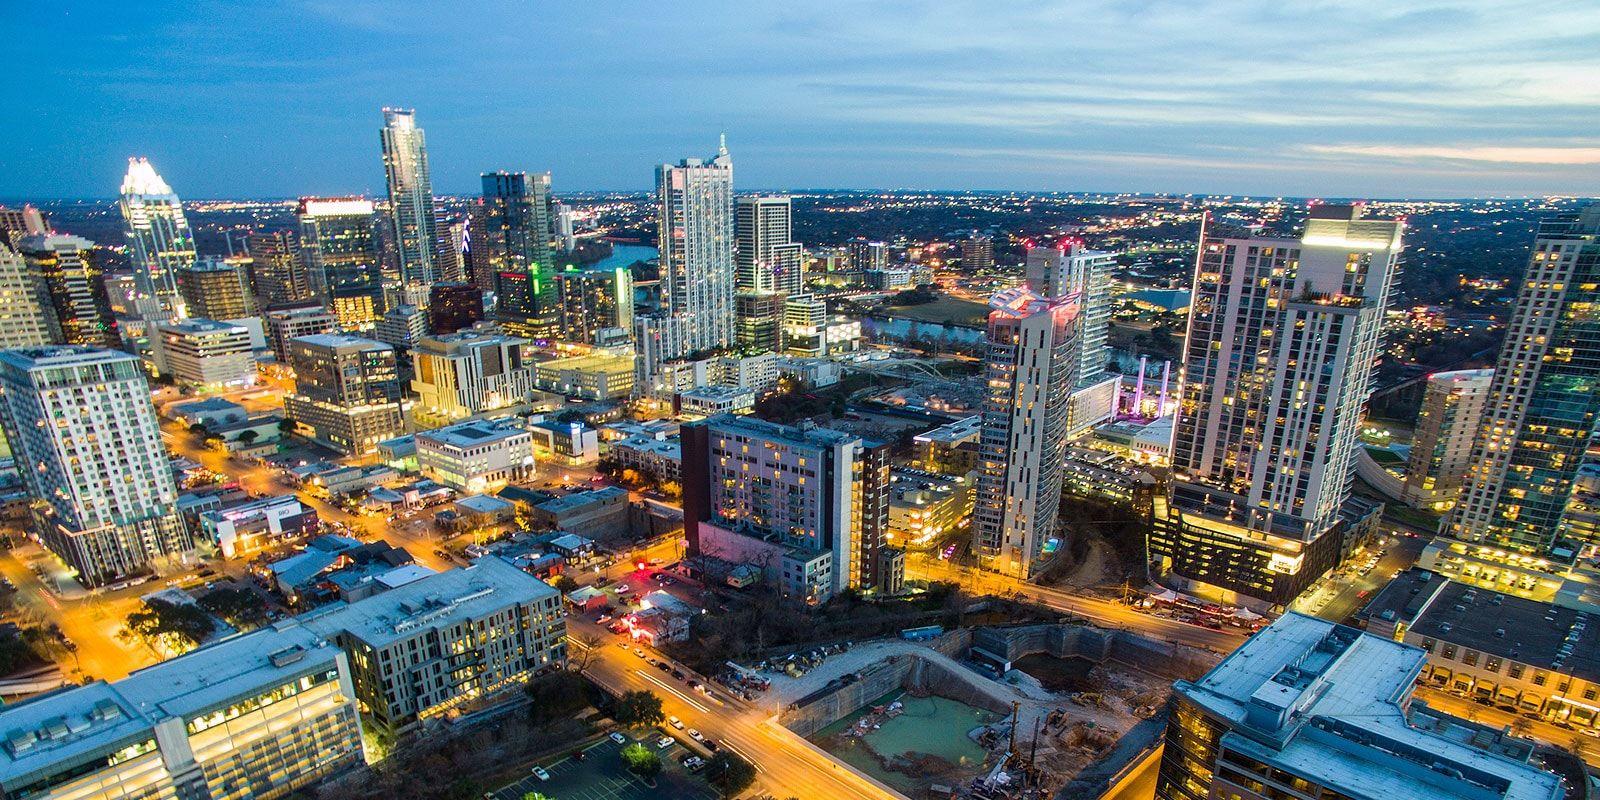 Night Cityscape of Austin